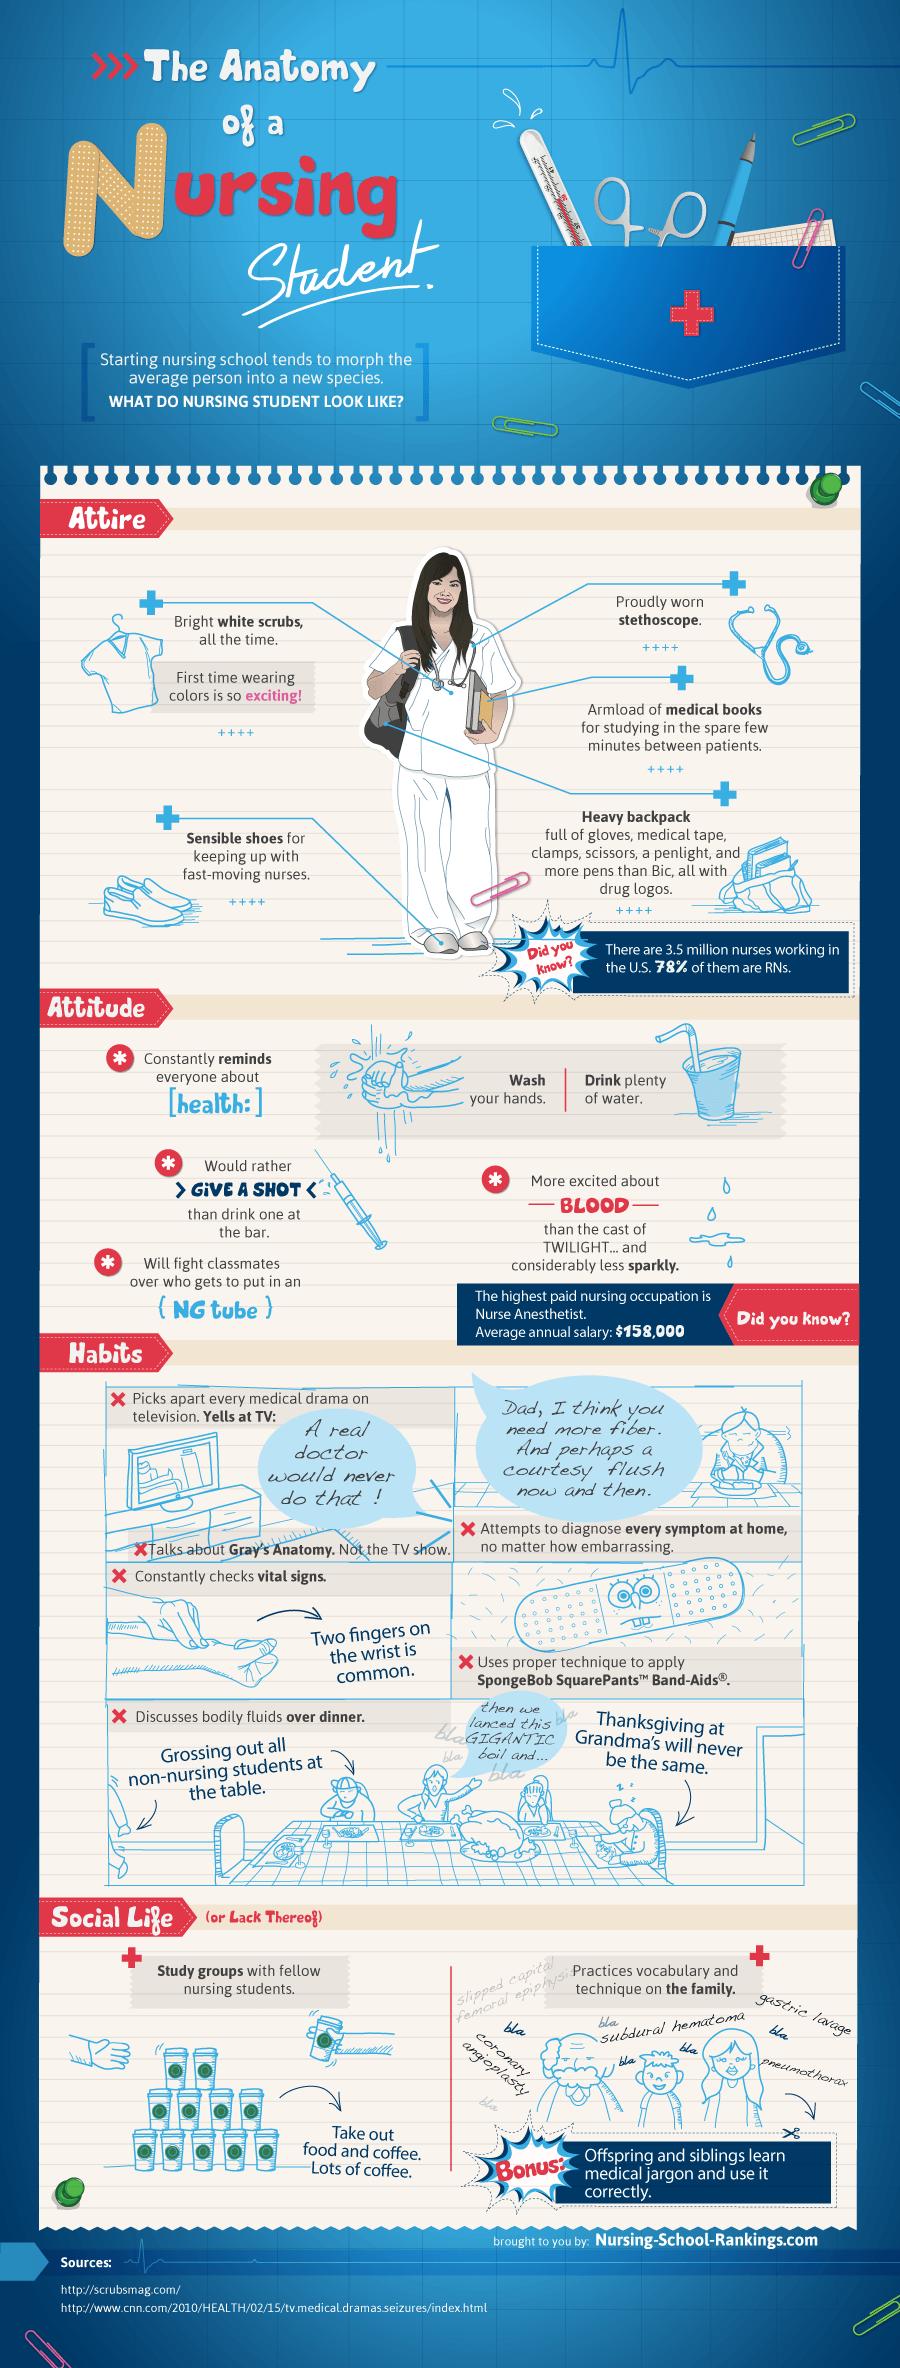 The Anatomy of a Nursing Student: Nursing Infographic